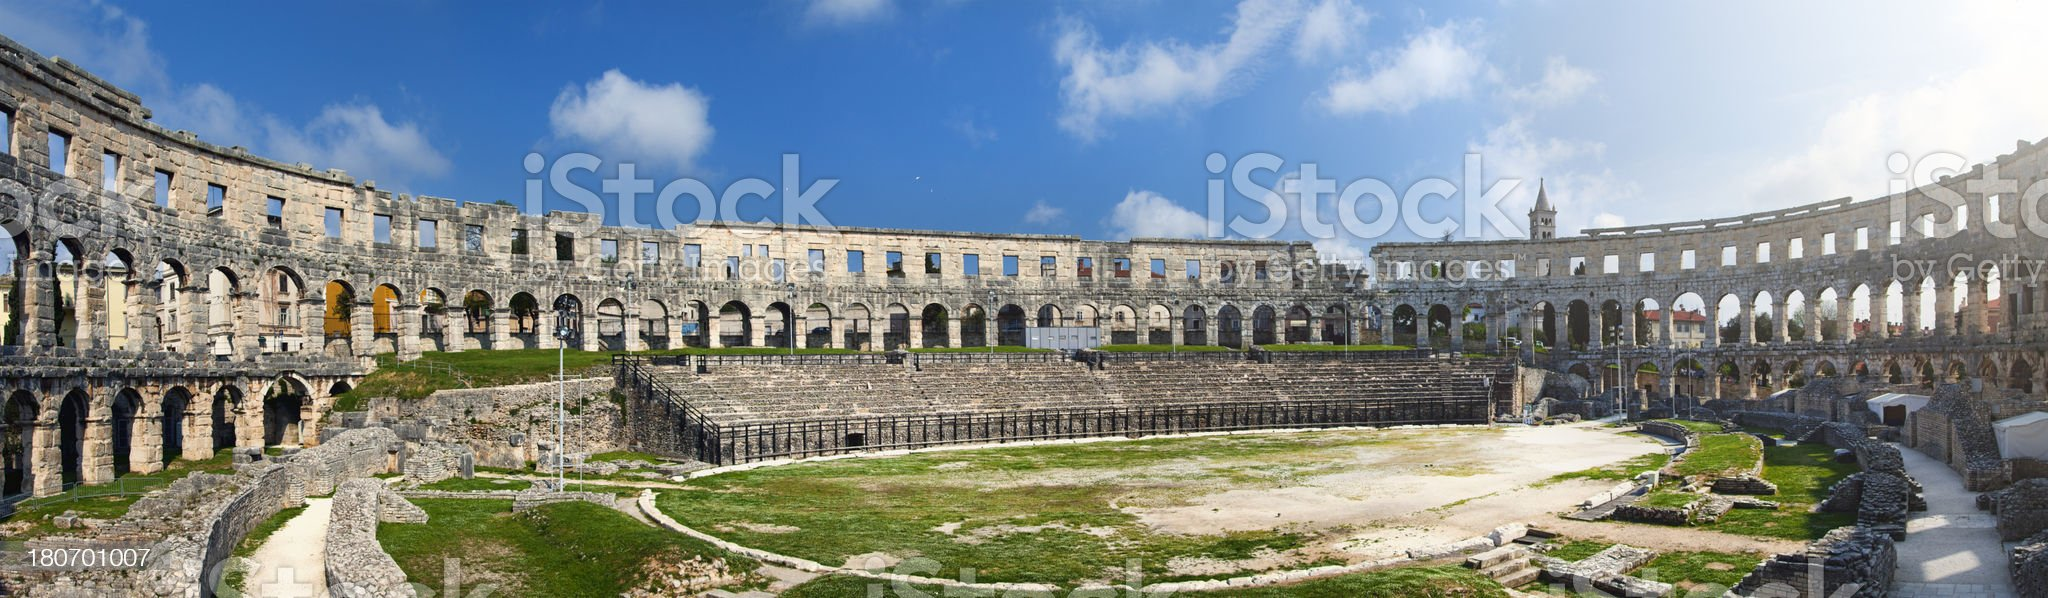 The Pula Arena panoramic shot royalty-free stock photo